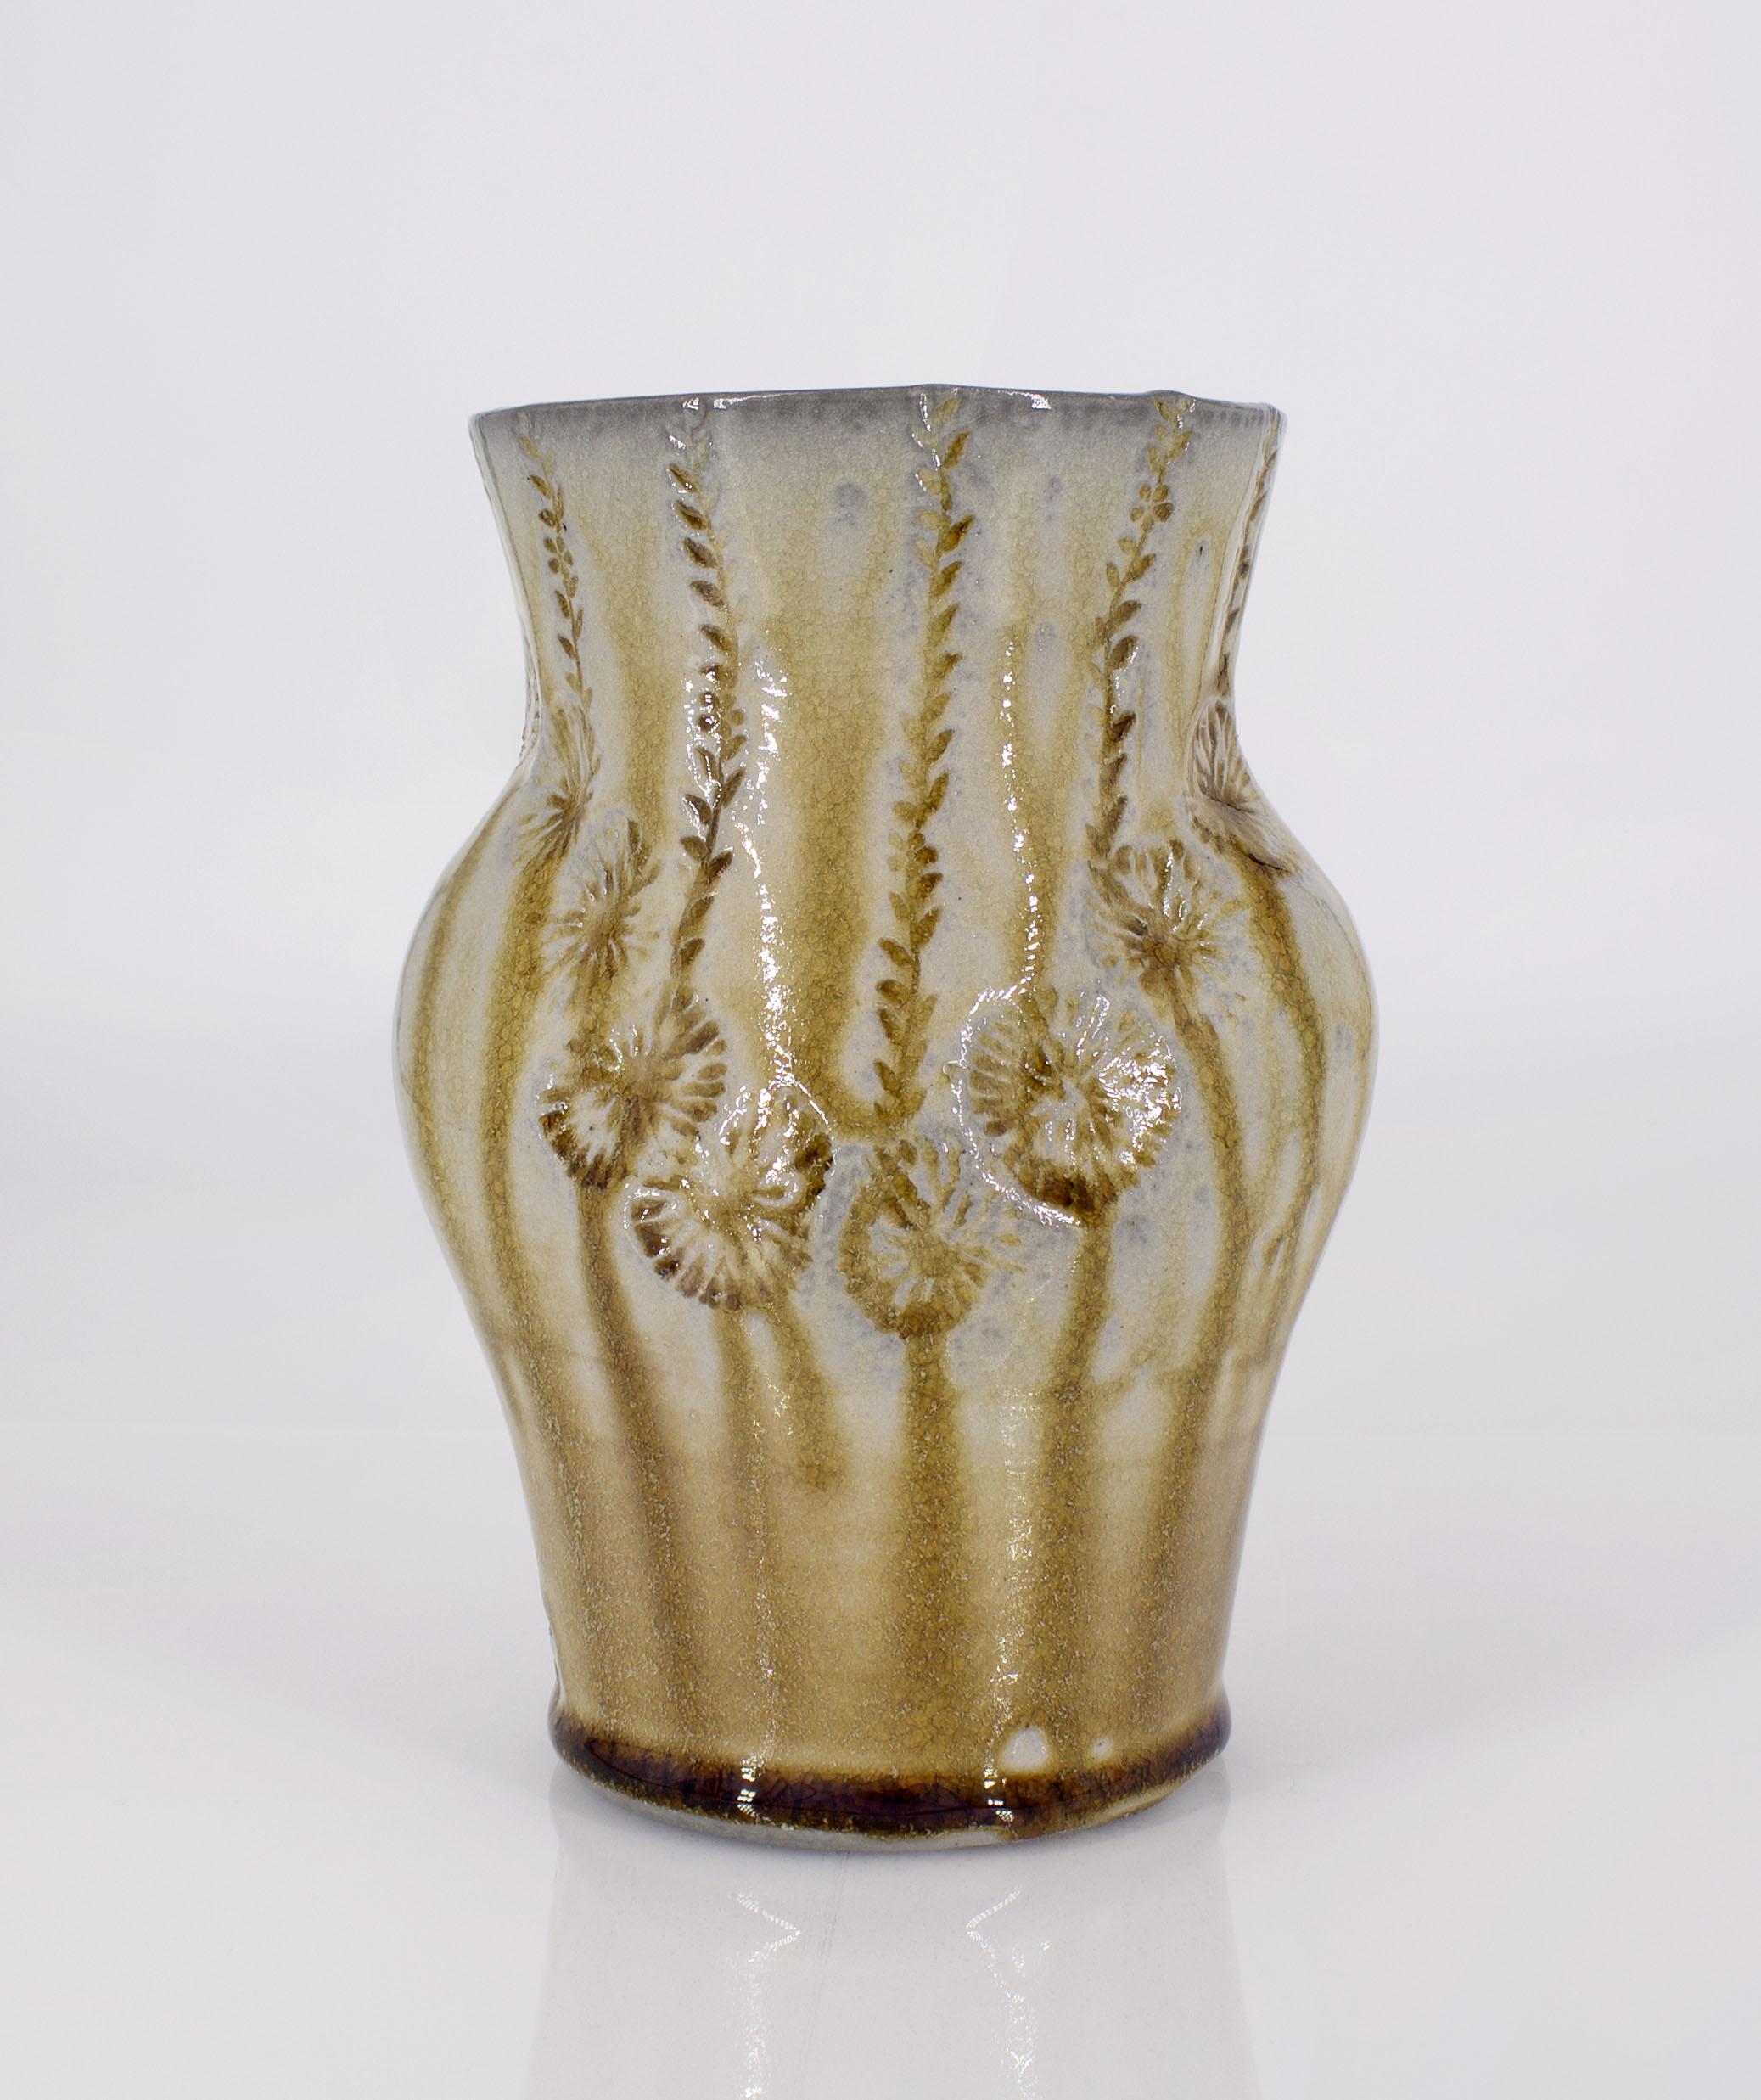 Soda fired vase, 2020